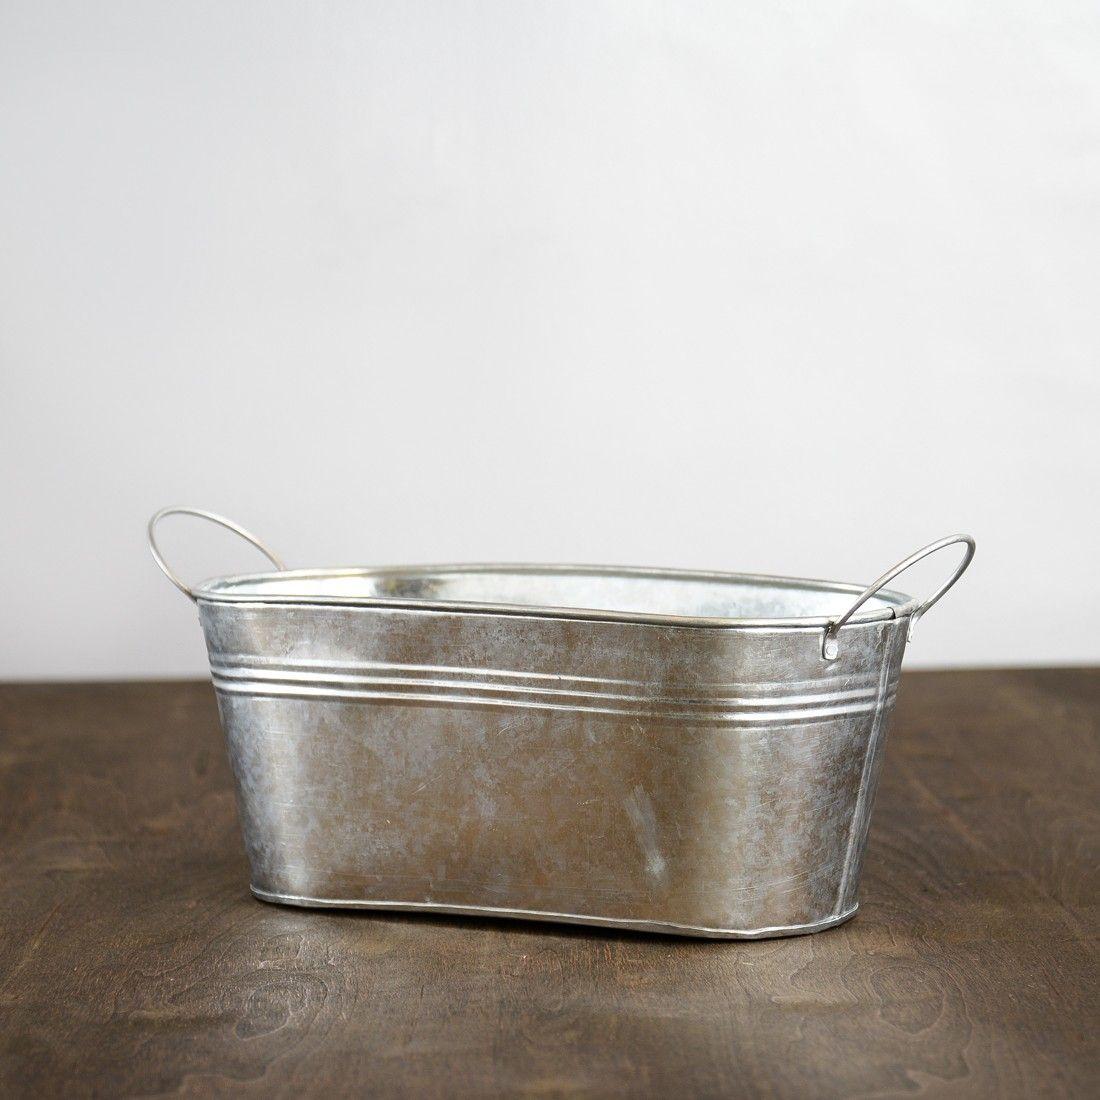 Silver Oval Metal Bucket: for creamers, milk, bailey's. Galvanized ...